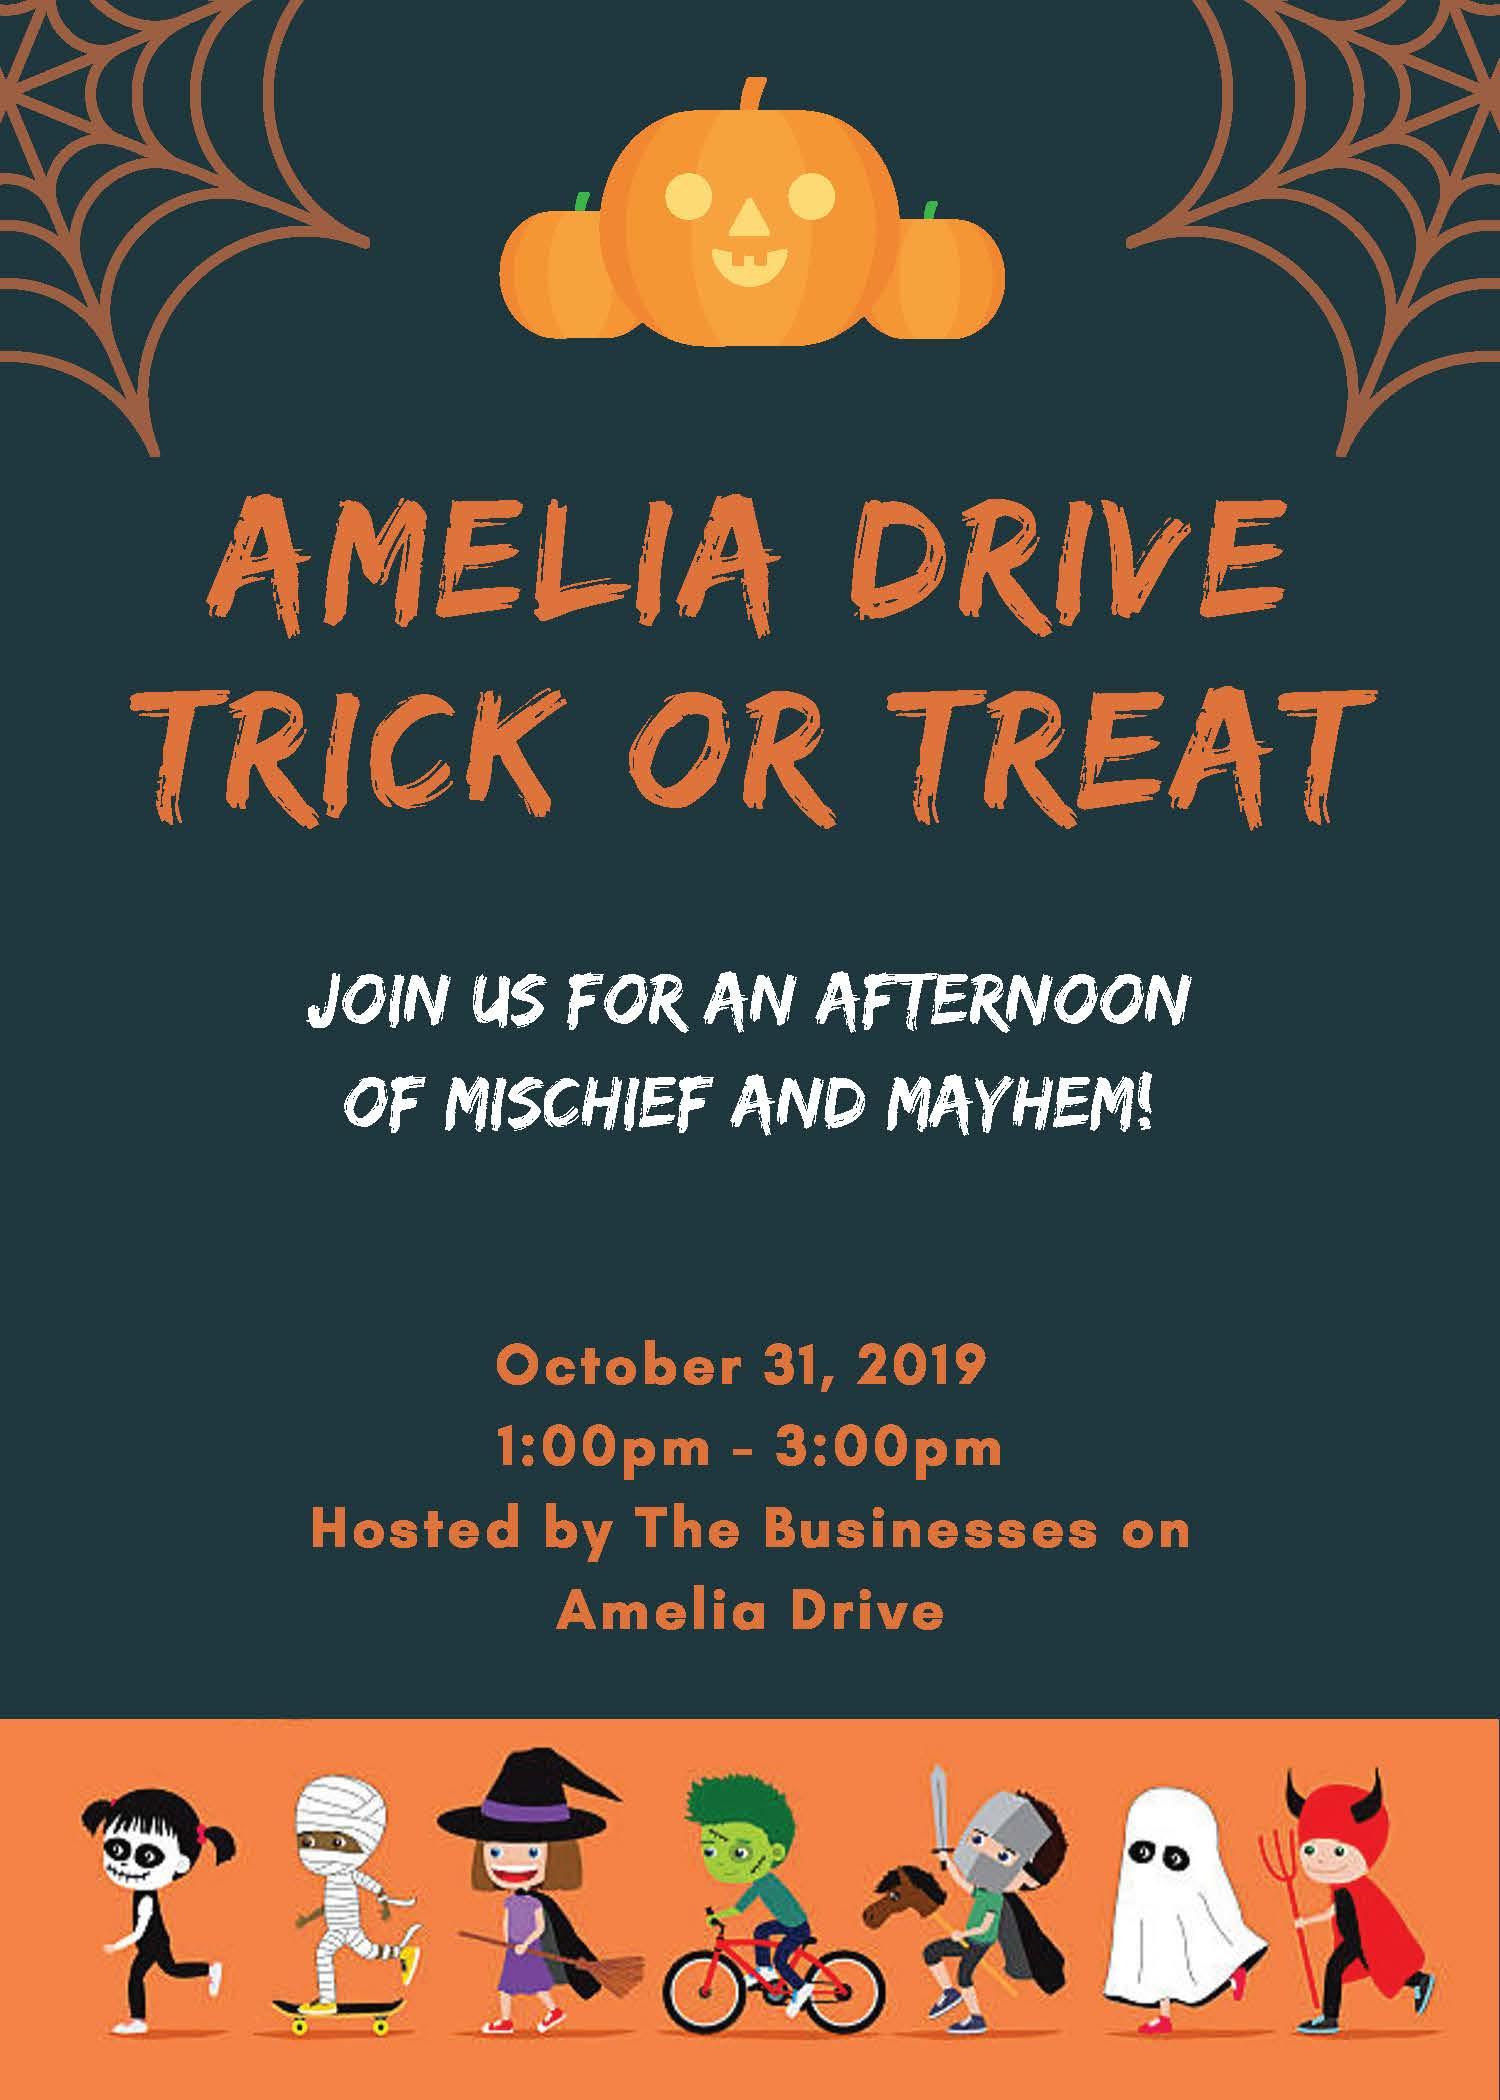 Amelia-Drive-Halloween